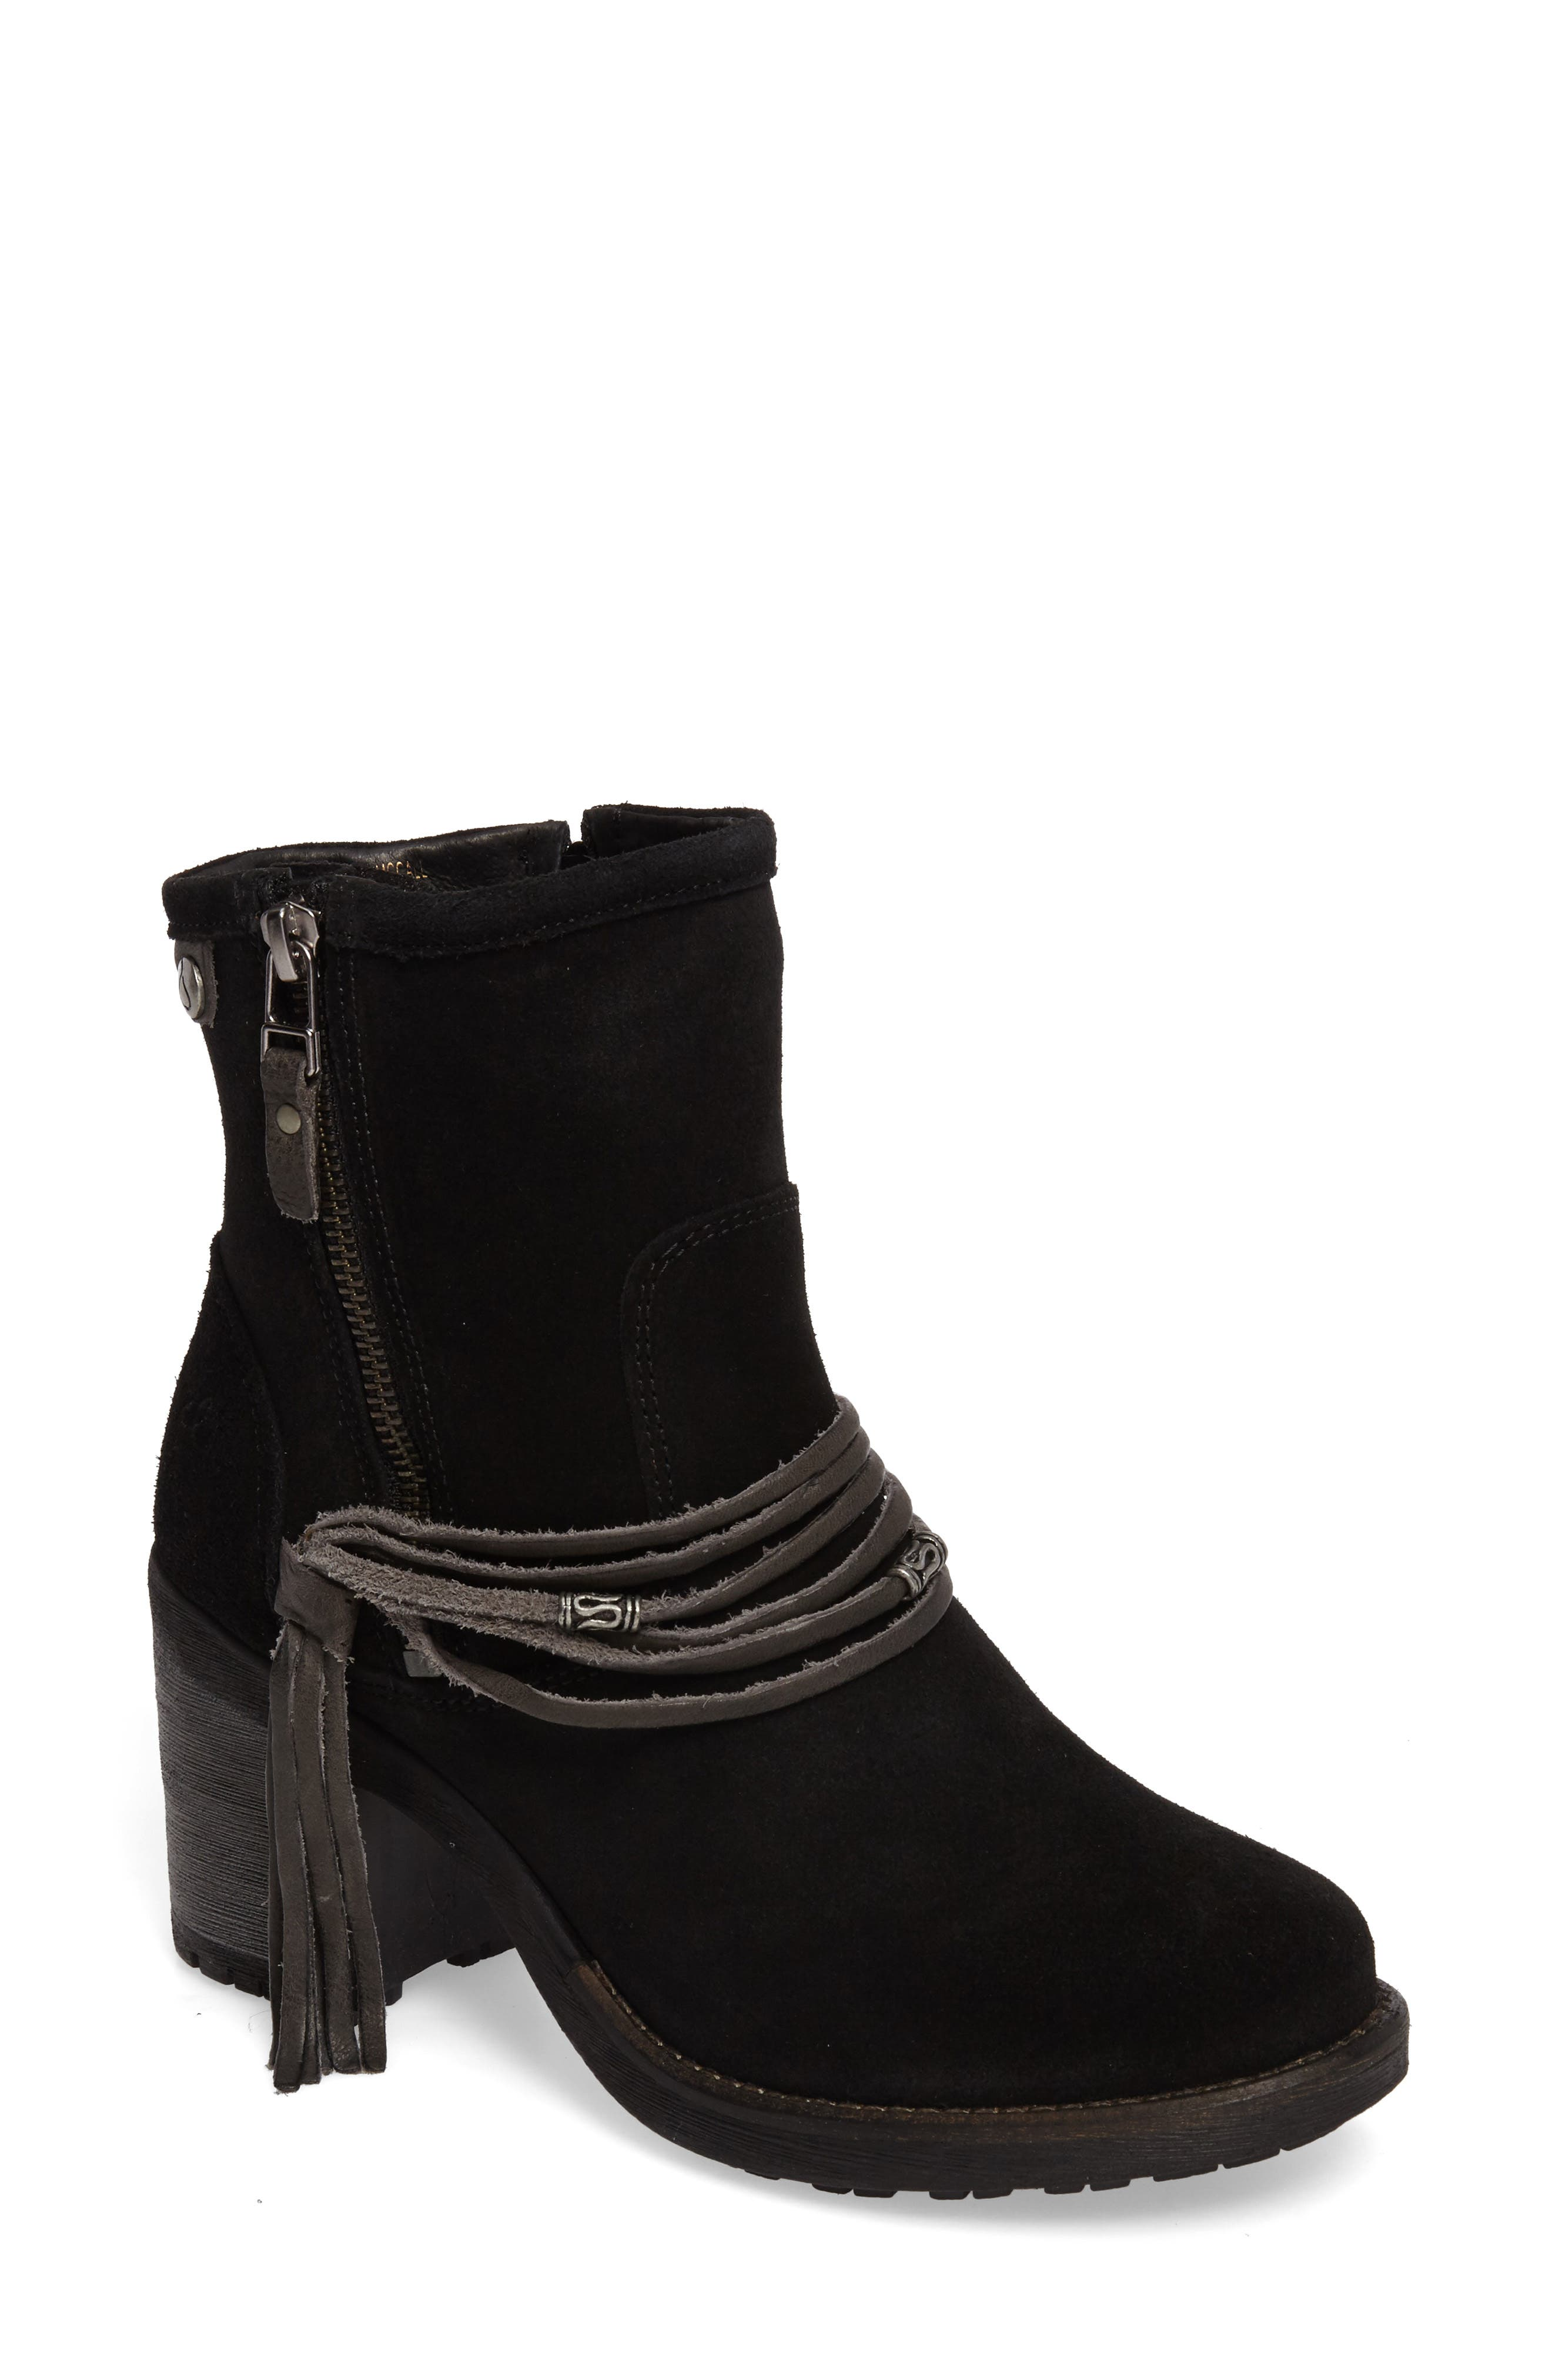 McCall Waterproof Boot,                         Main,                         color, 001